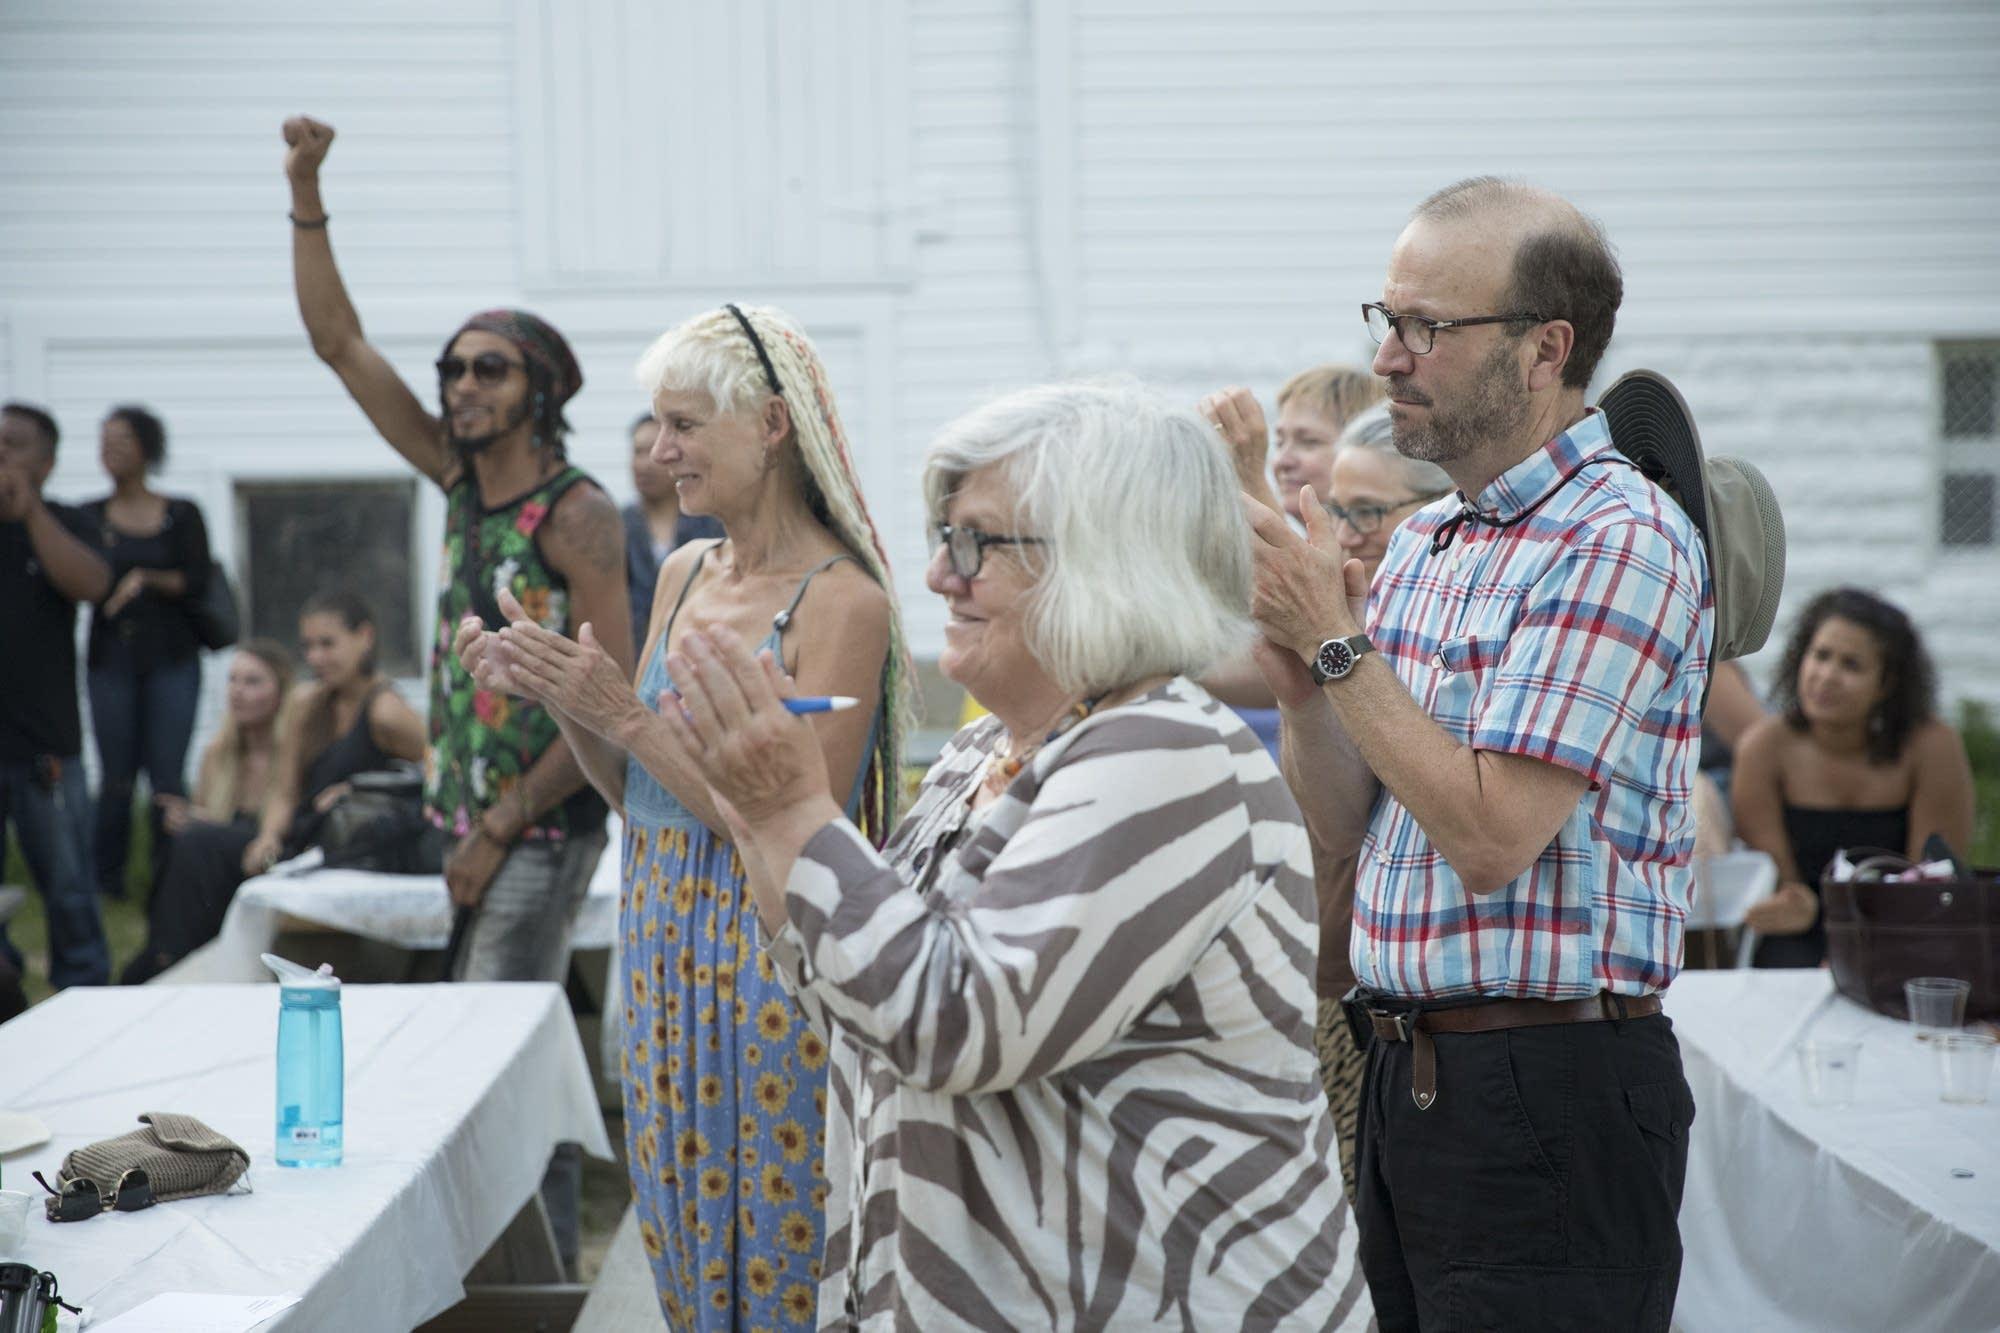 Castile memorial events